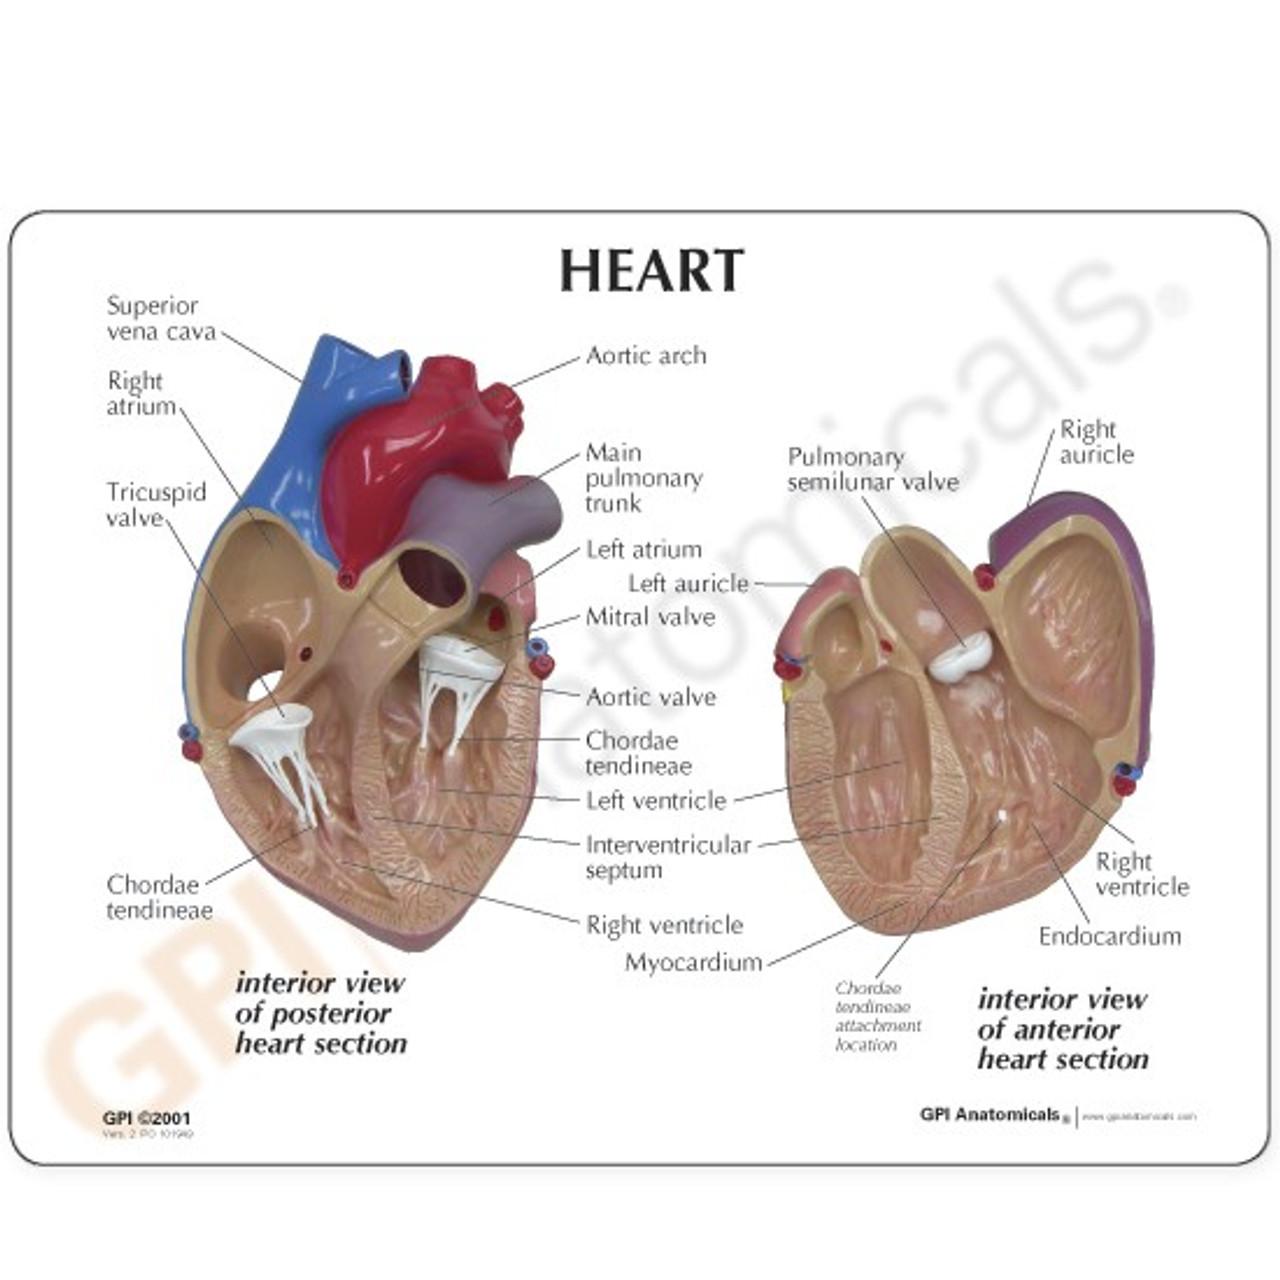 Heart Model Description Card